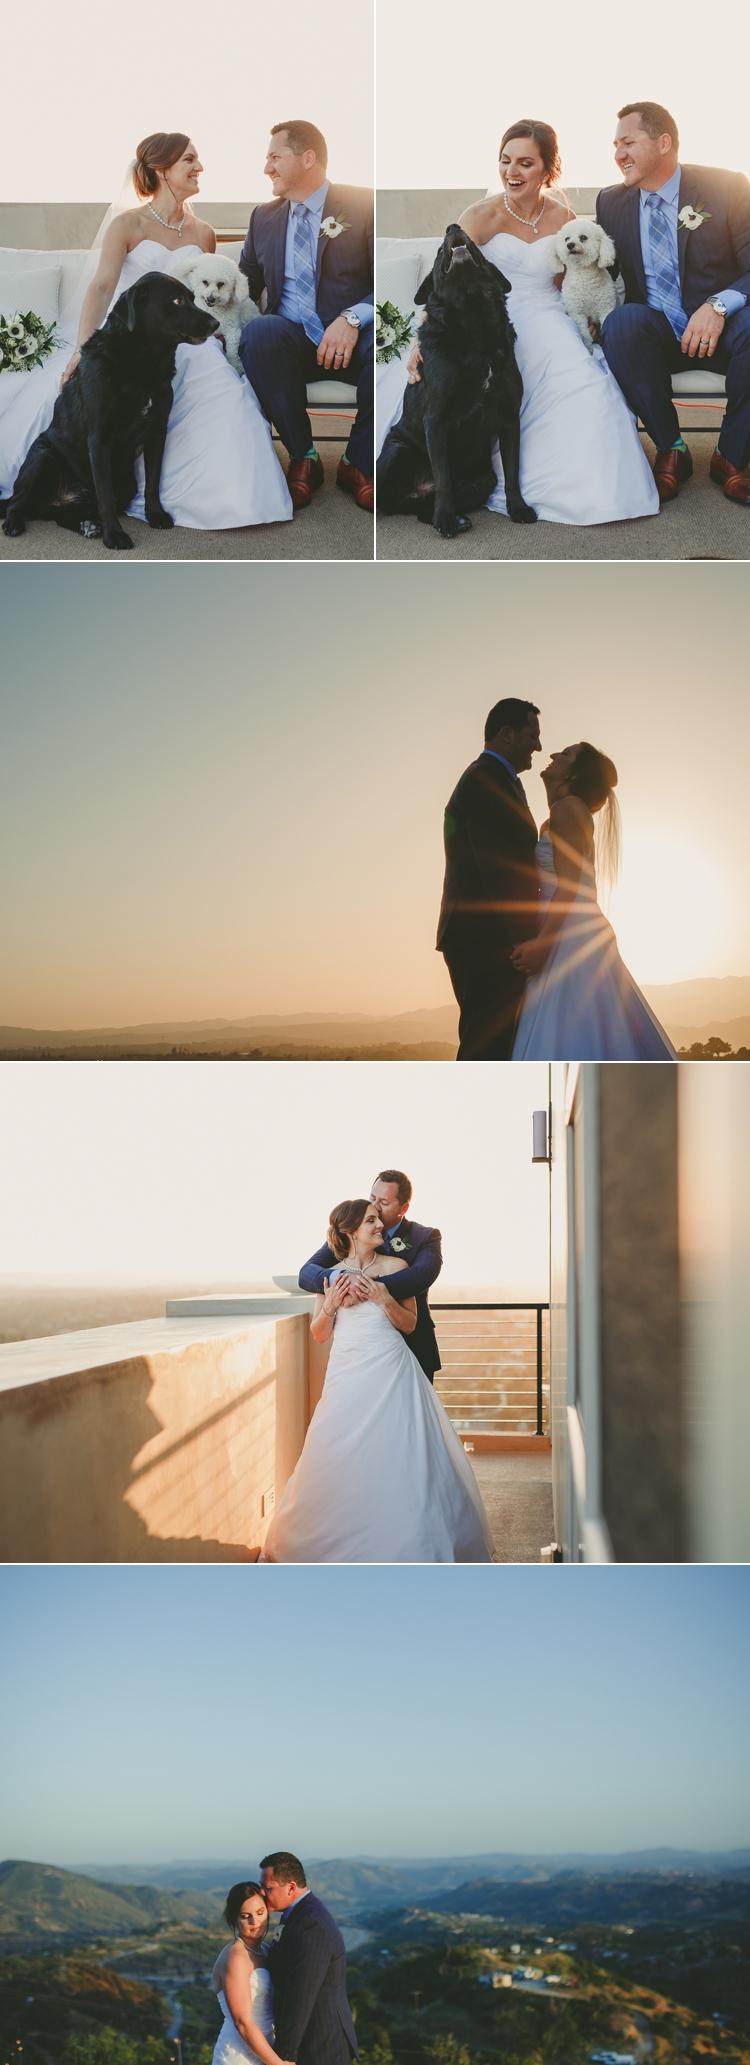 Fallbrook Backyard Wedding Photos 3888 East Mission Road